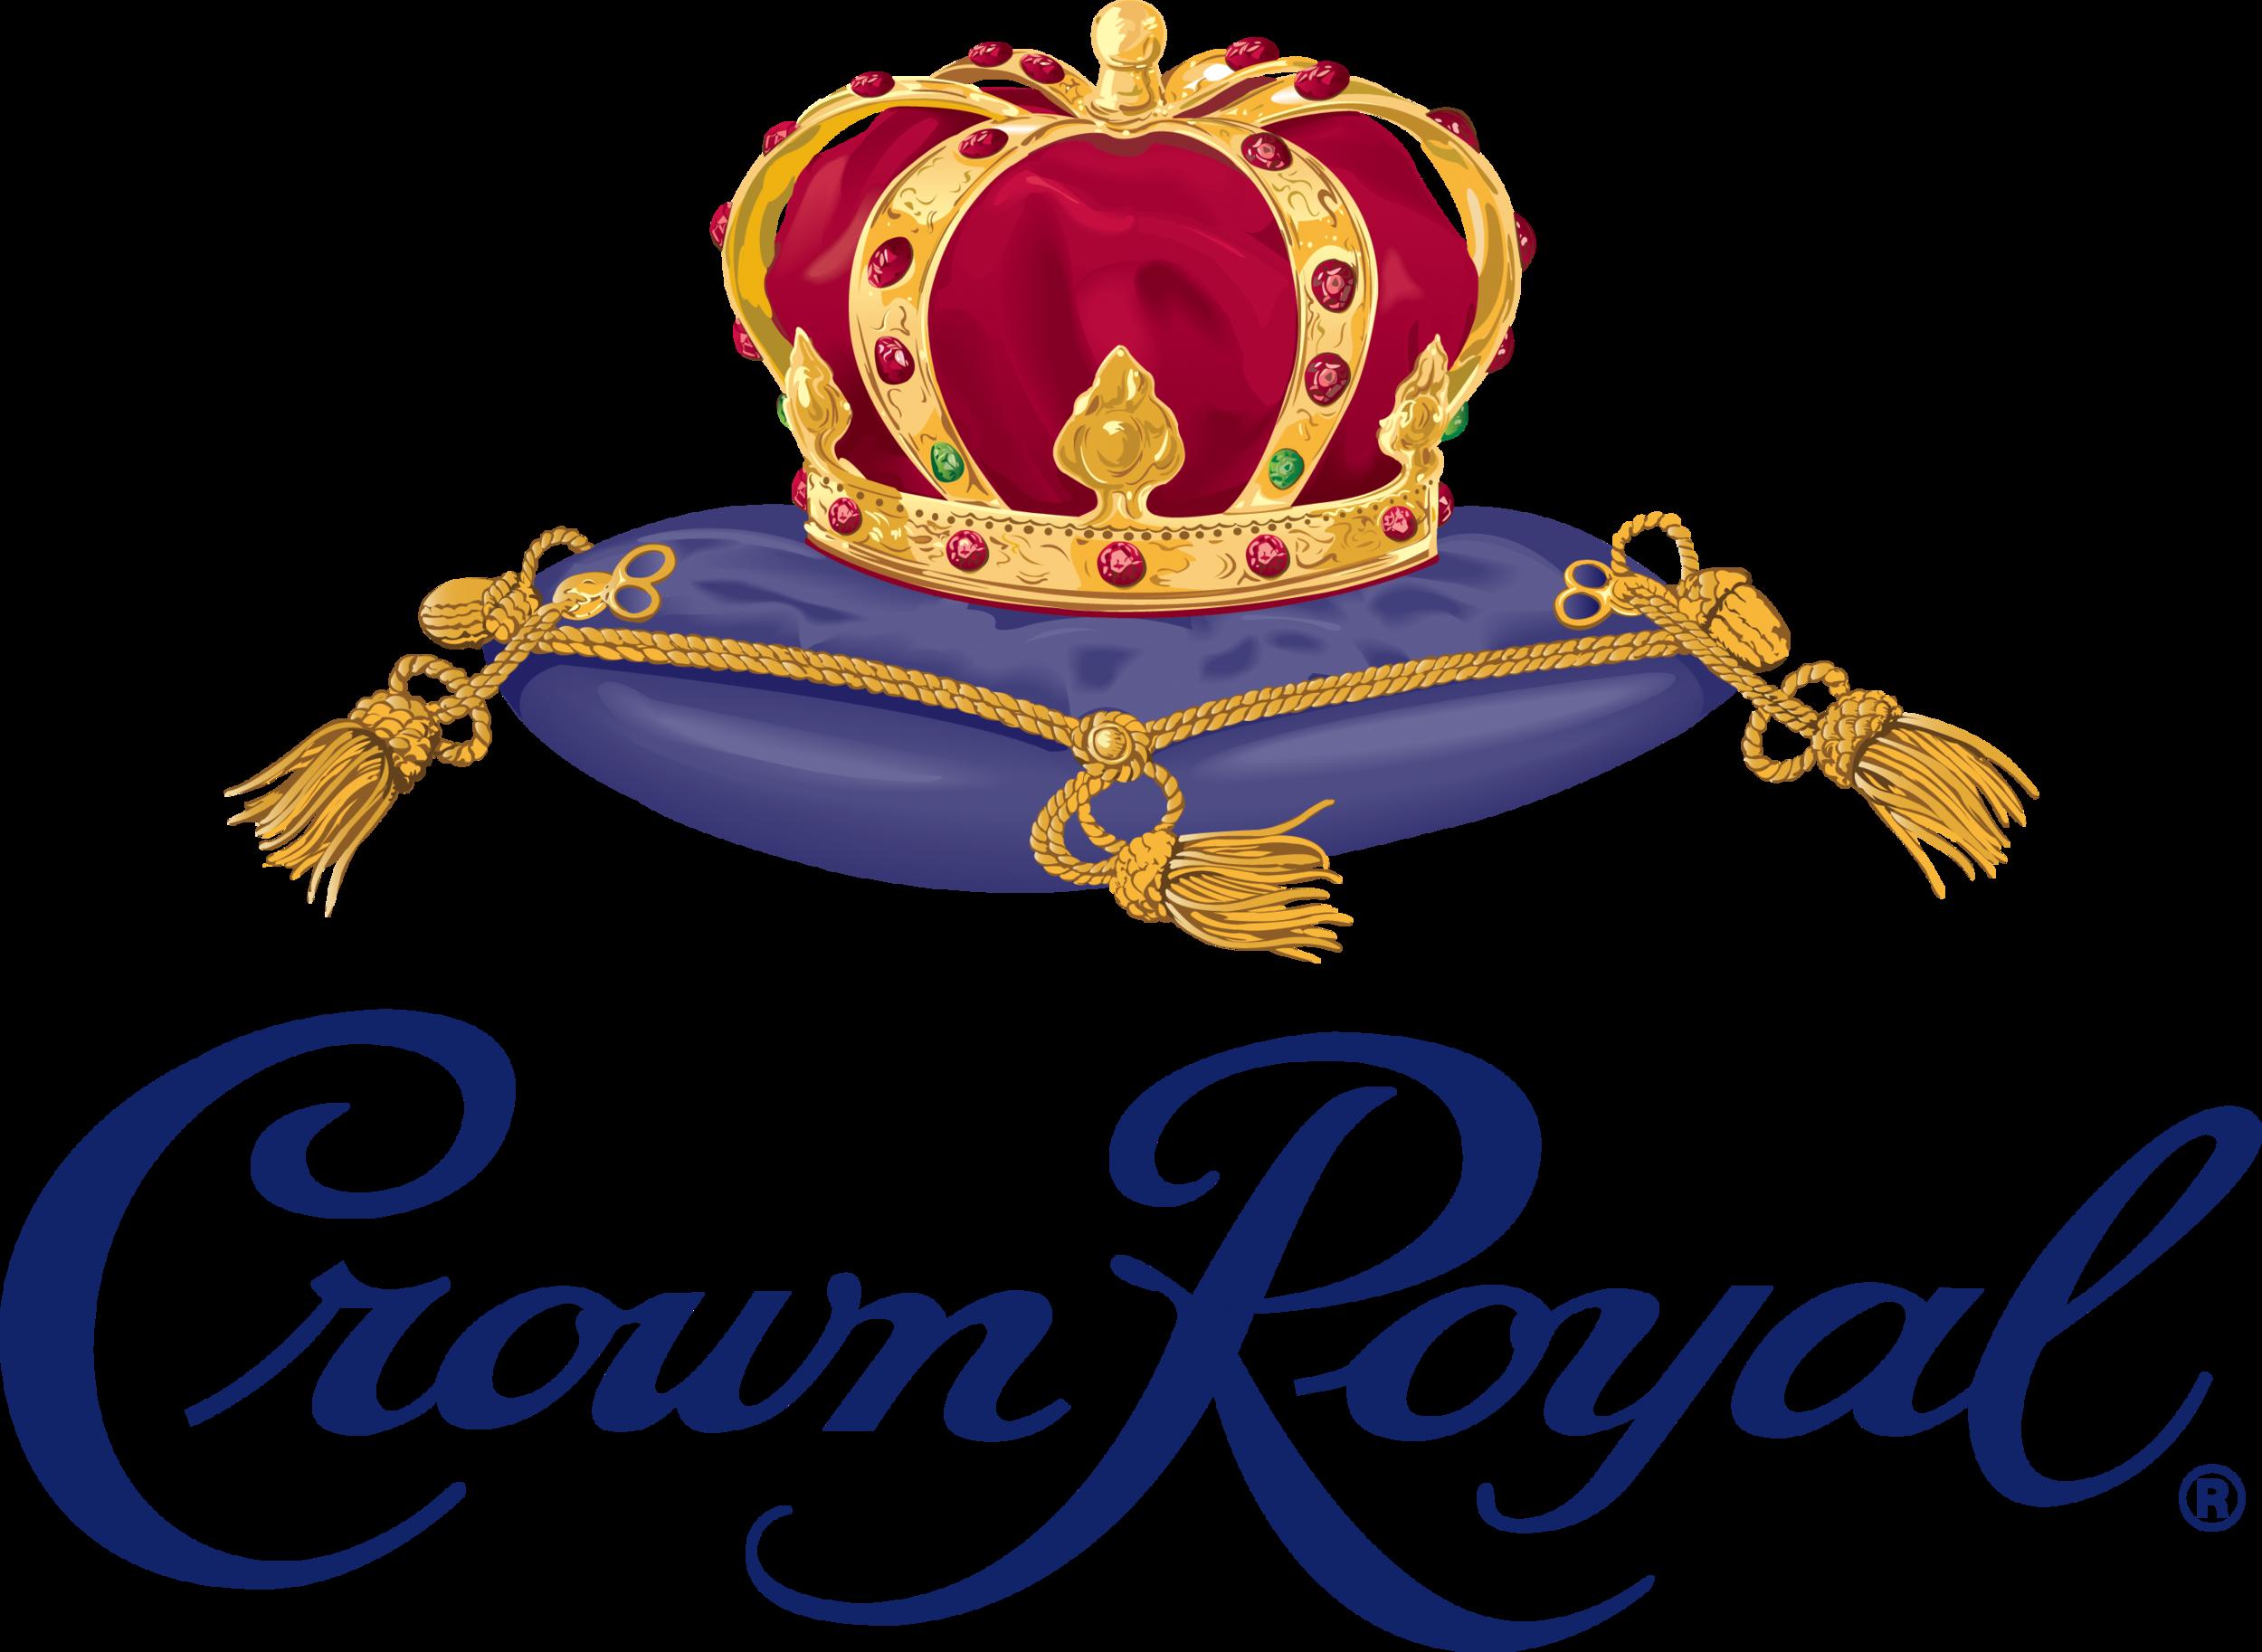 crown_royal.png